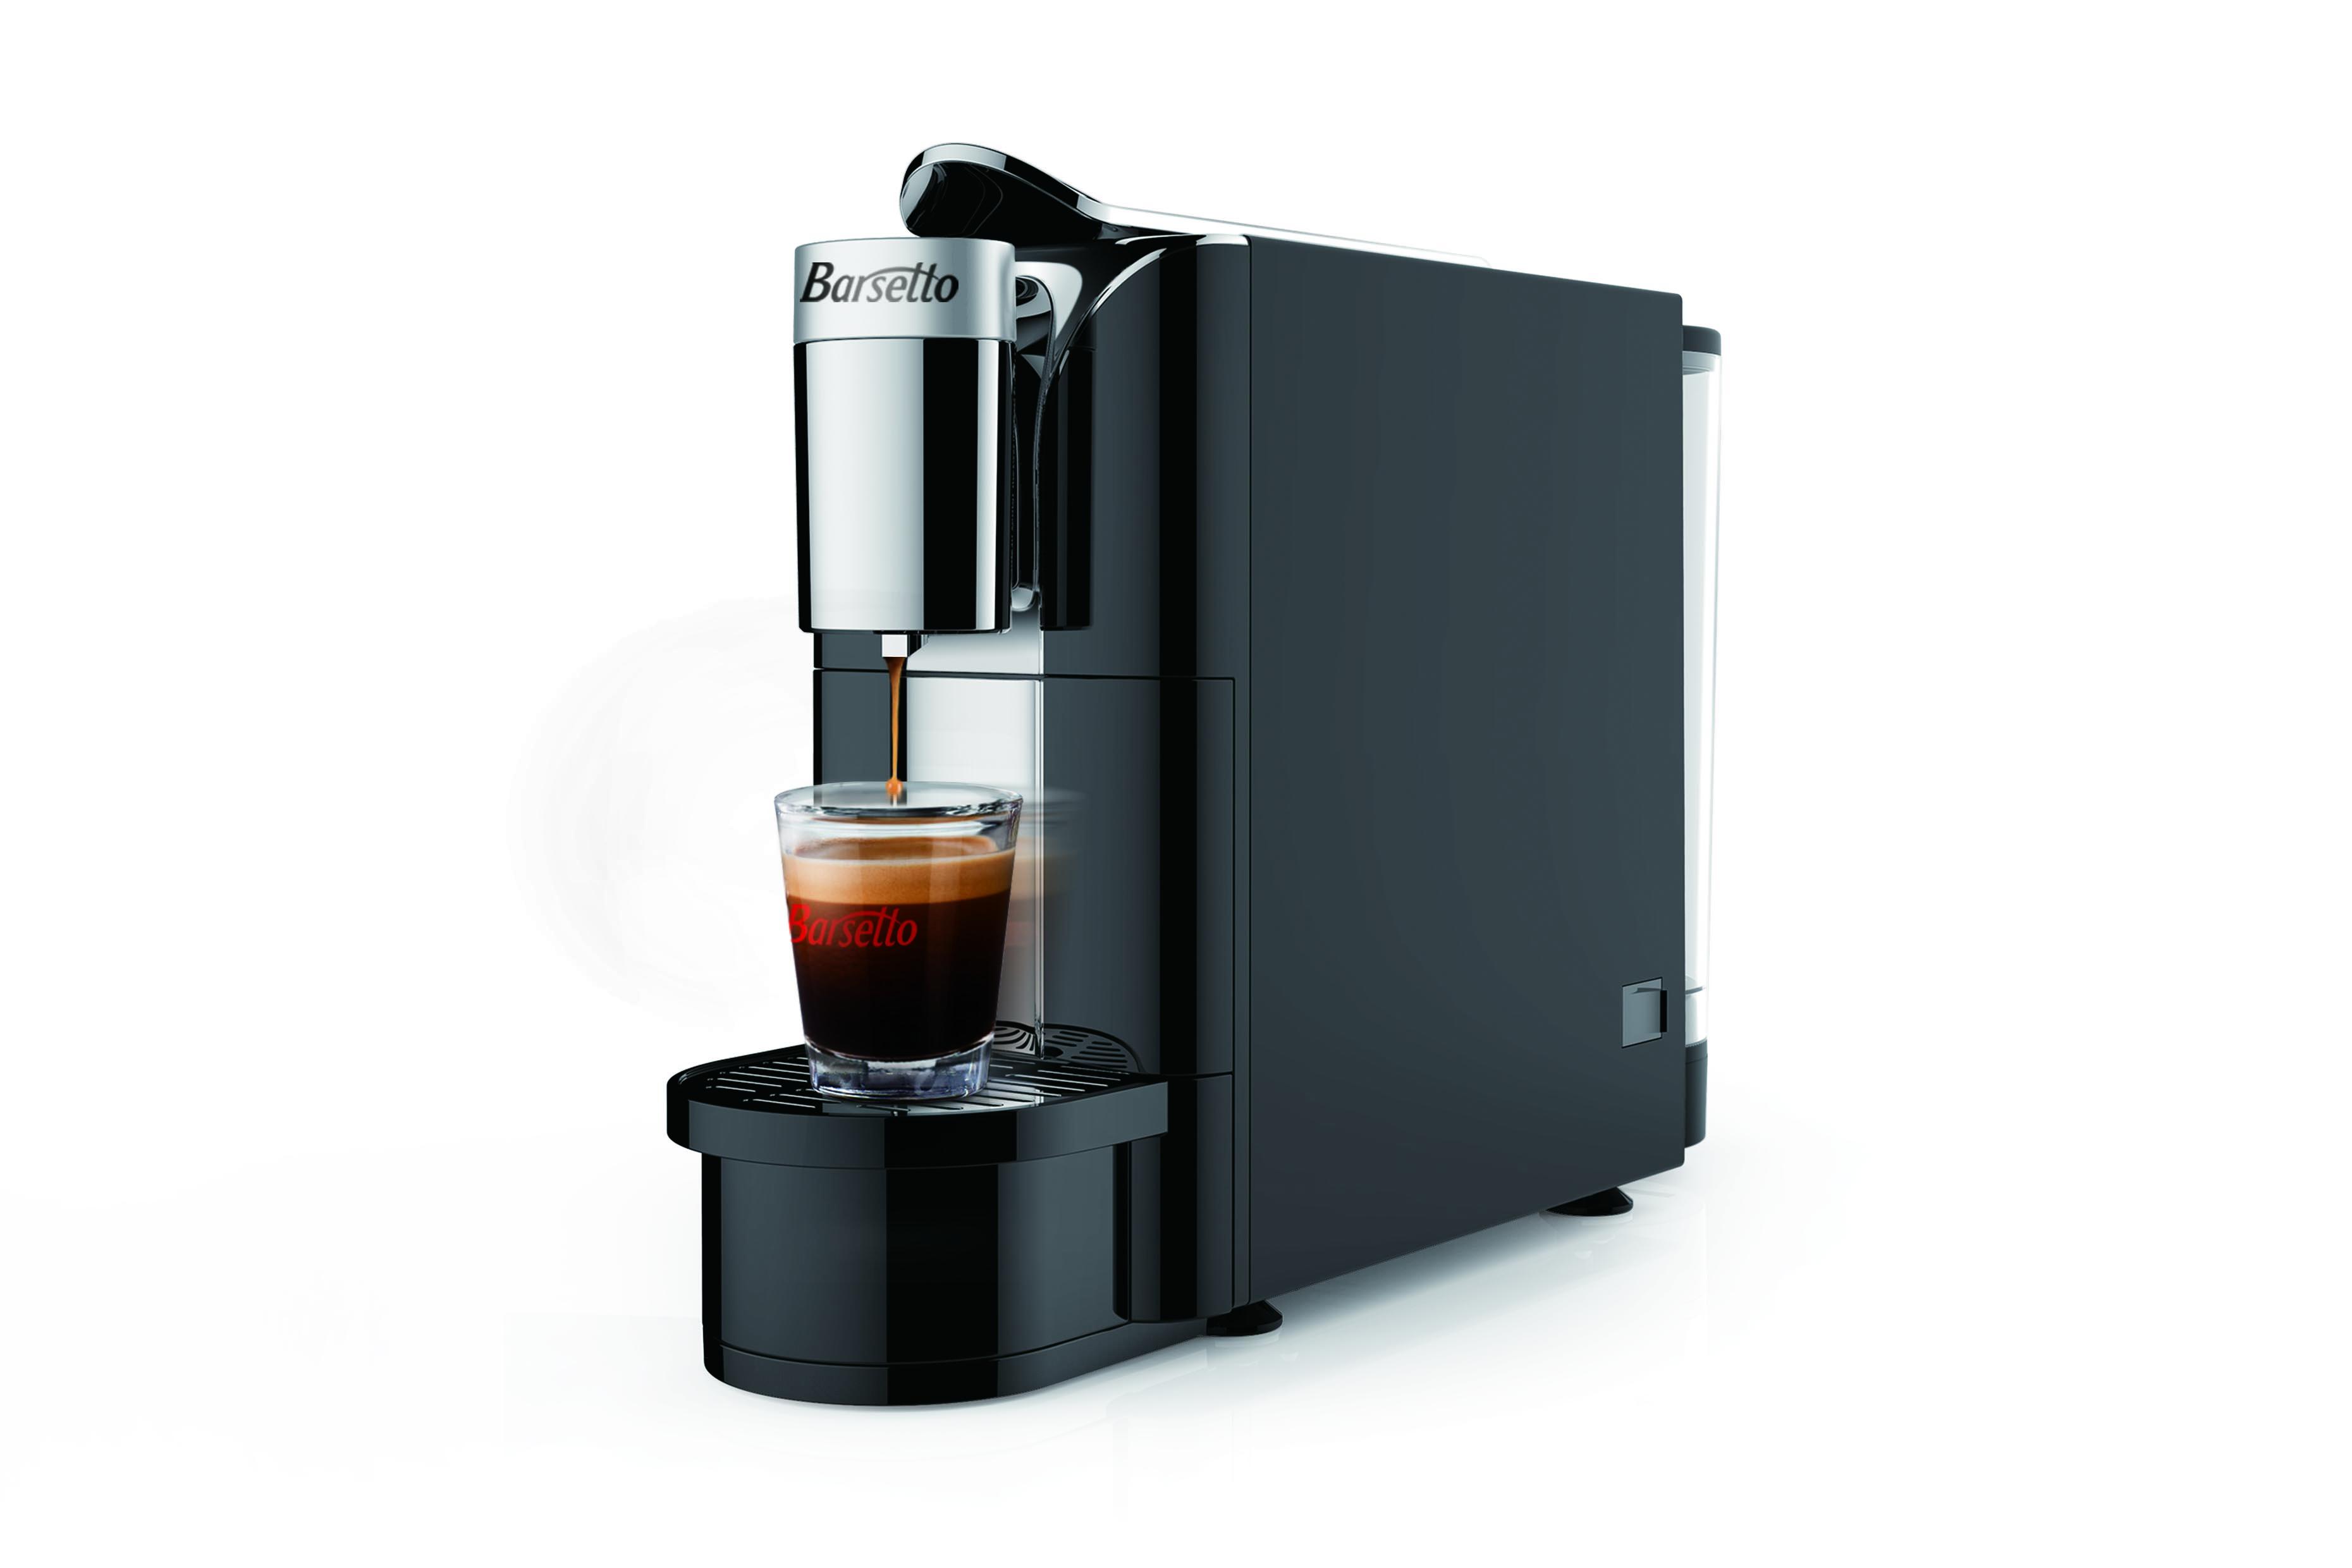 Barsetto 胶囊咖啡机 Handler Ⅱ BAC006N